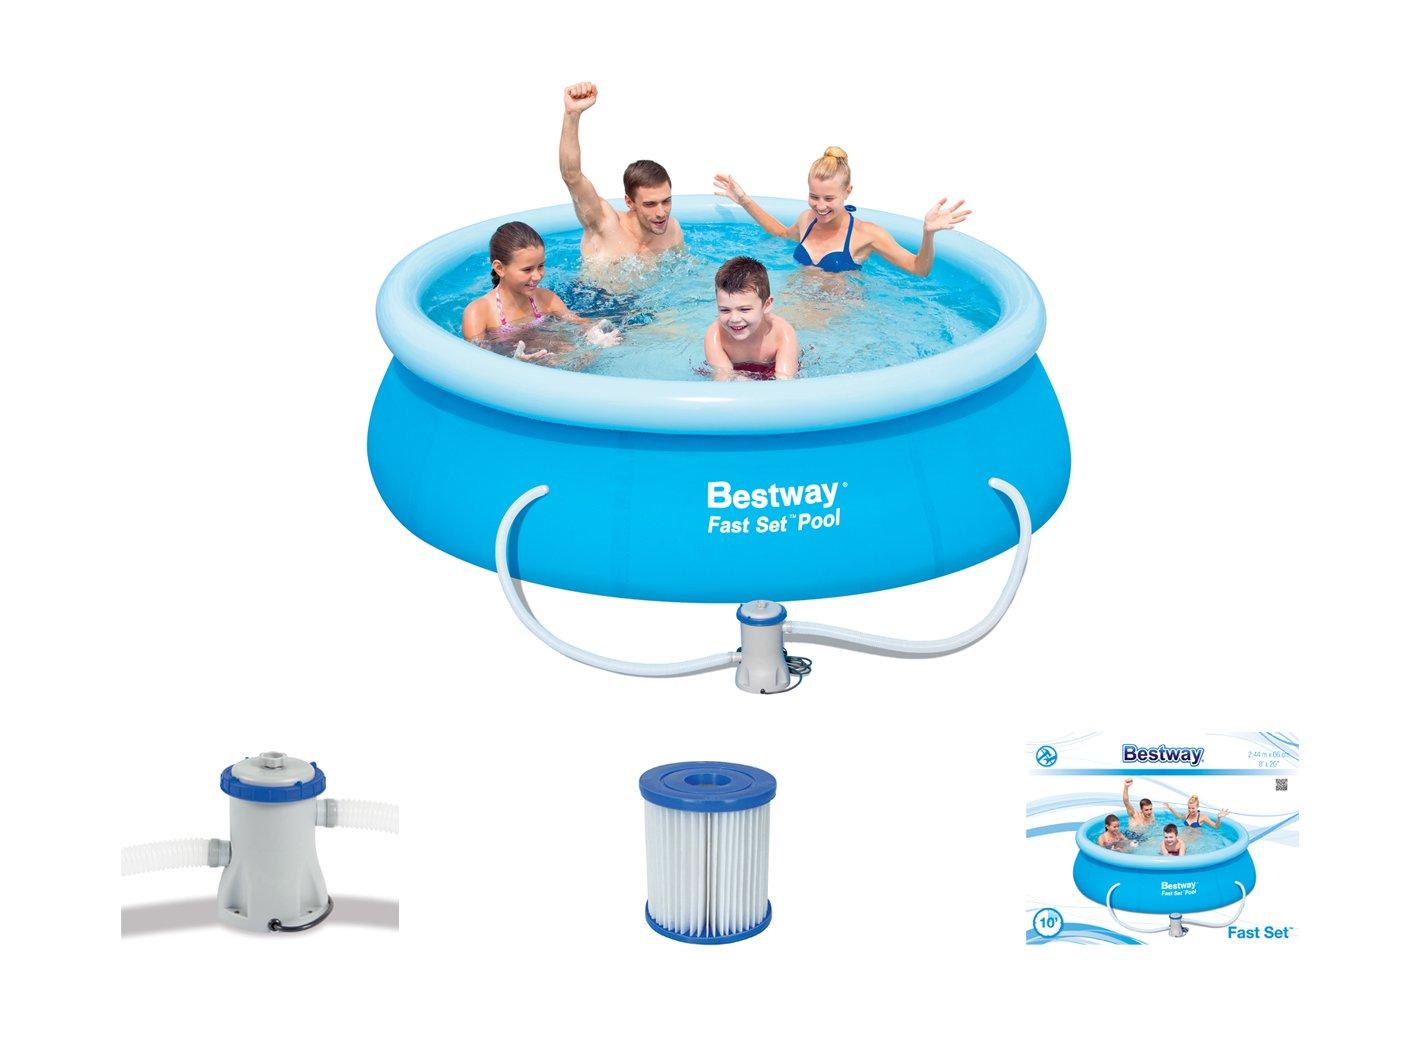 Bestway set piscina gonfiabile fast set pool 244 x 66 cm for Piscina best way